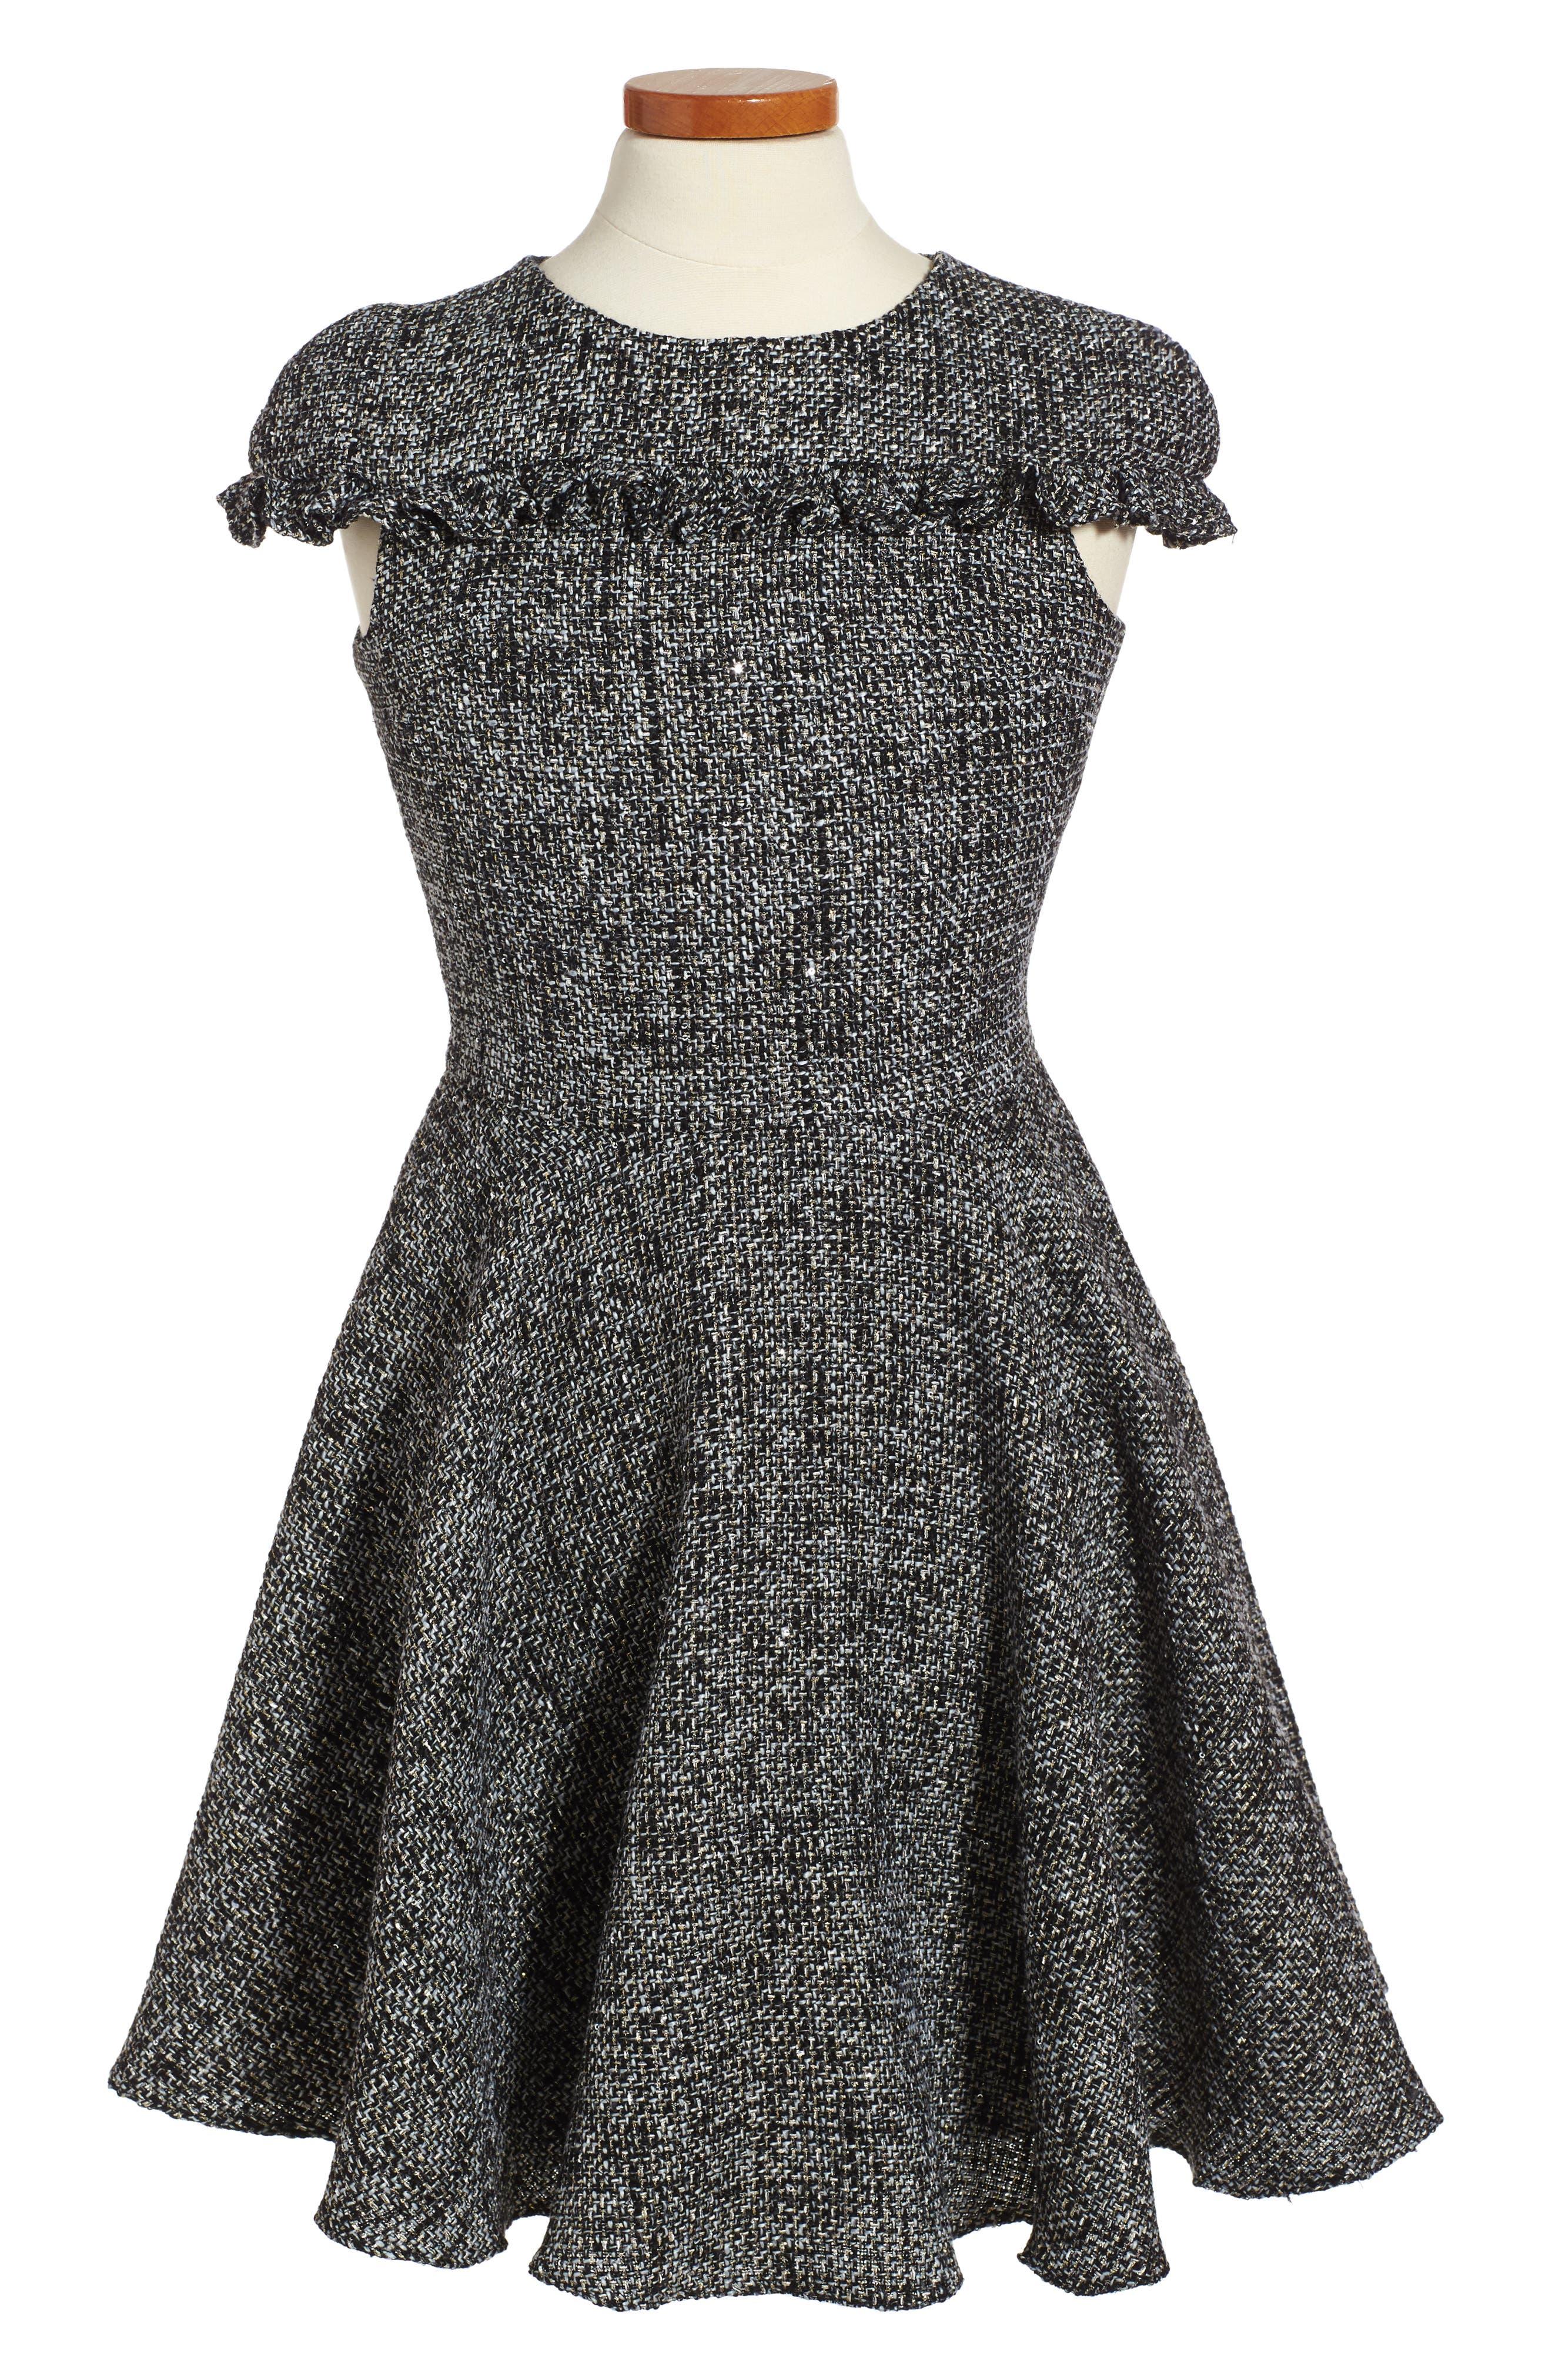 Main Image - David Charles Sequin Tweed Dress (Big Girls)